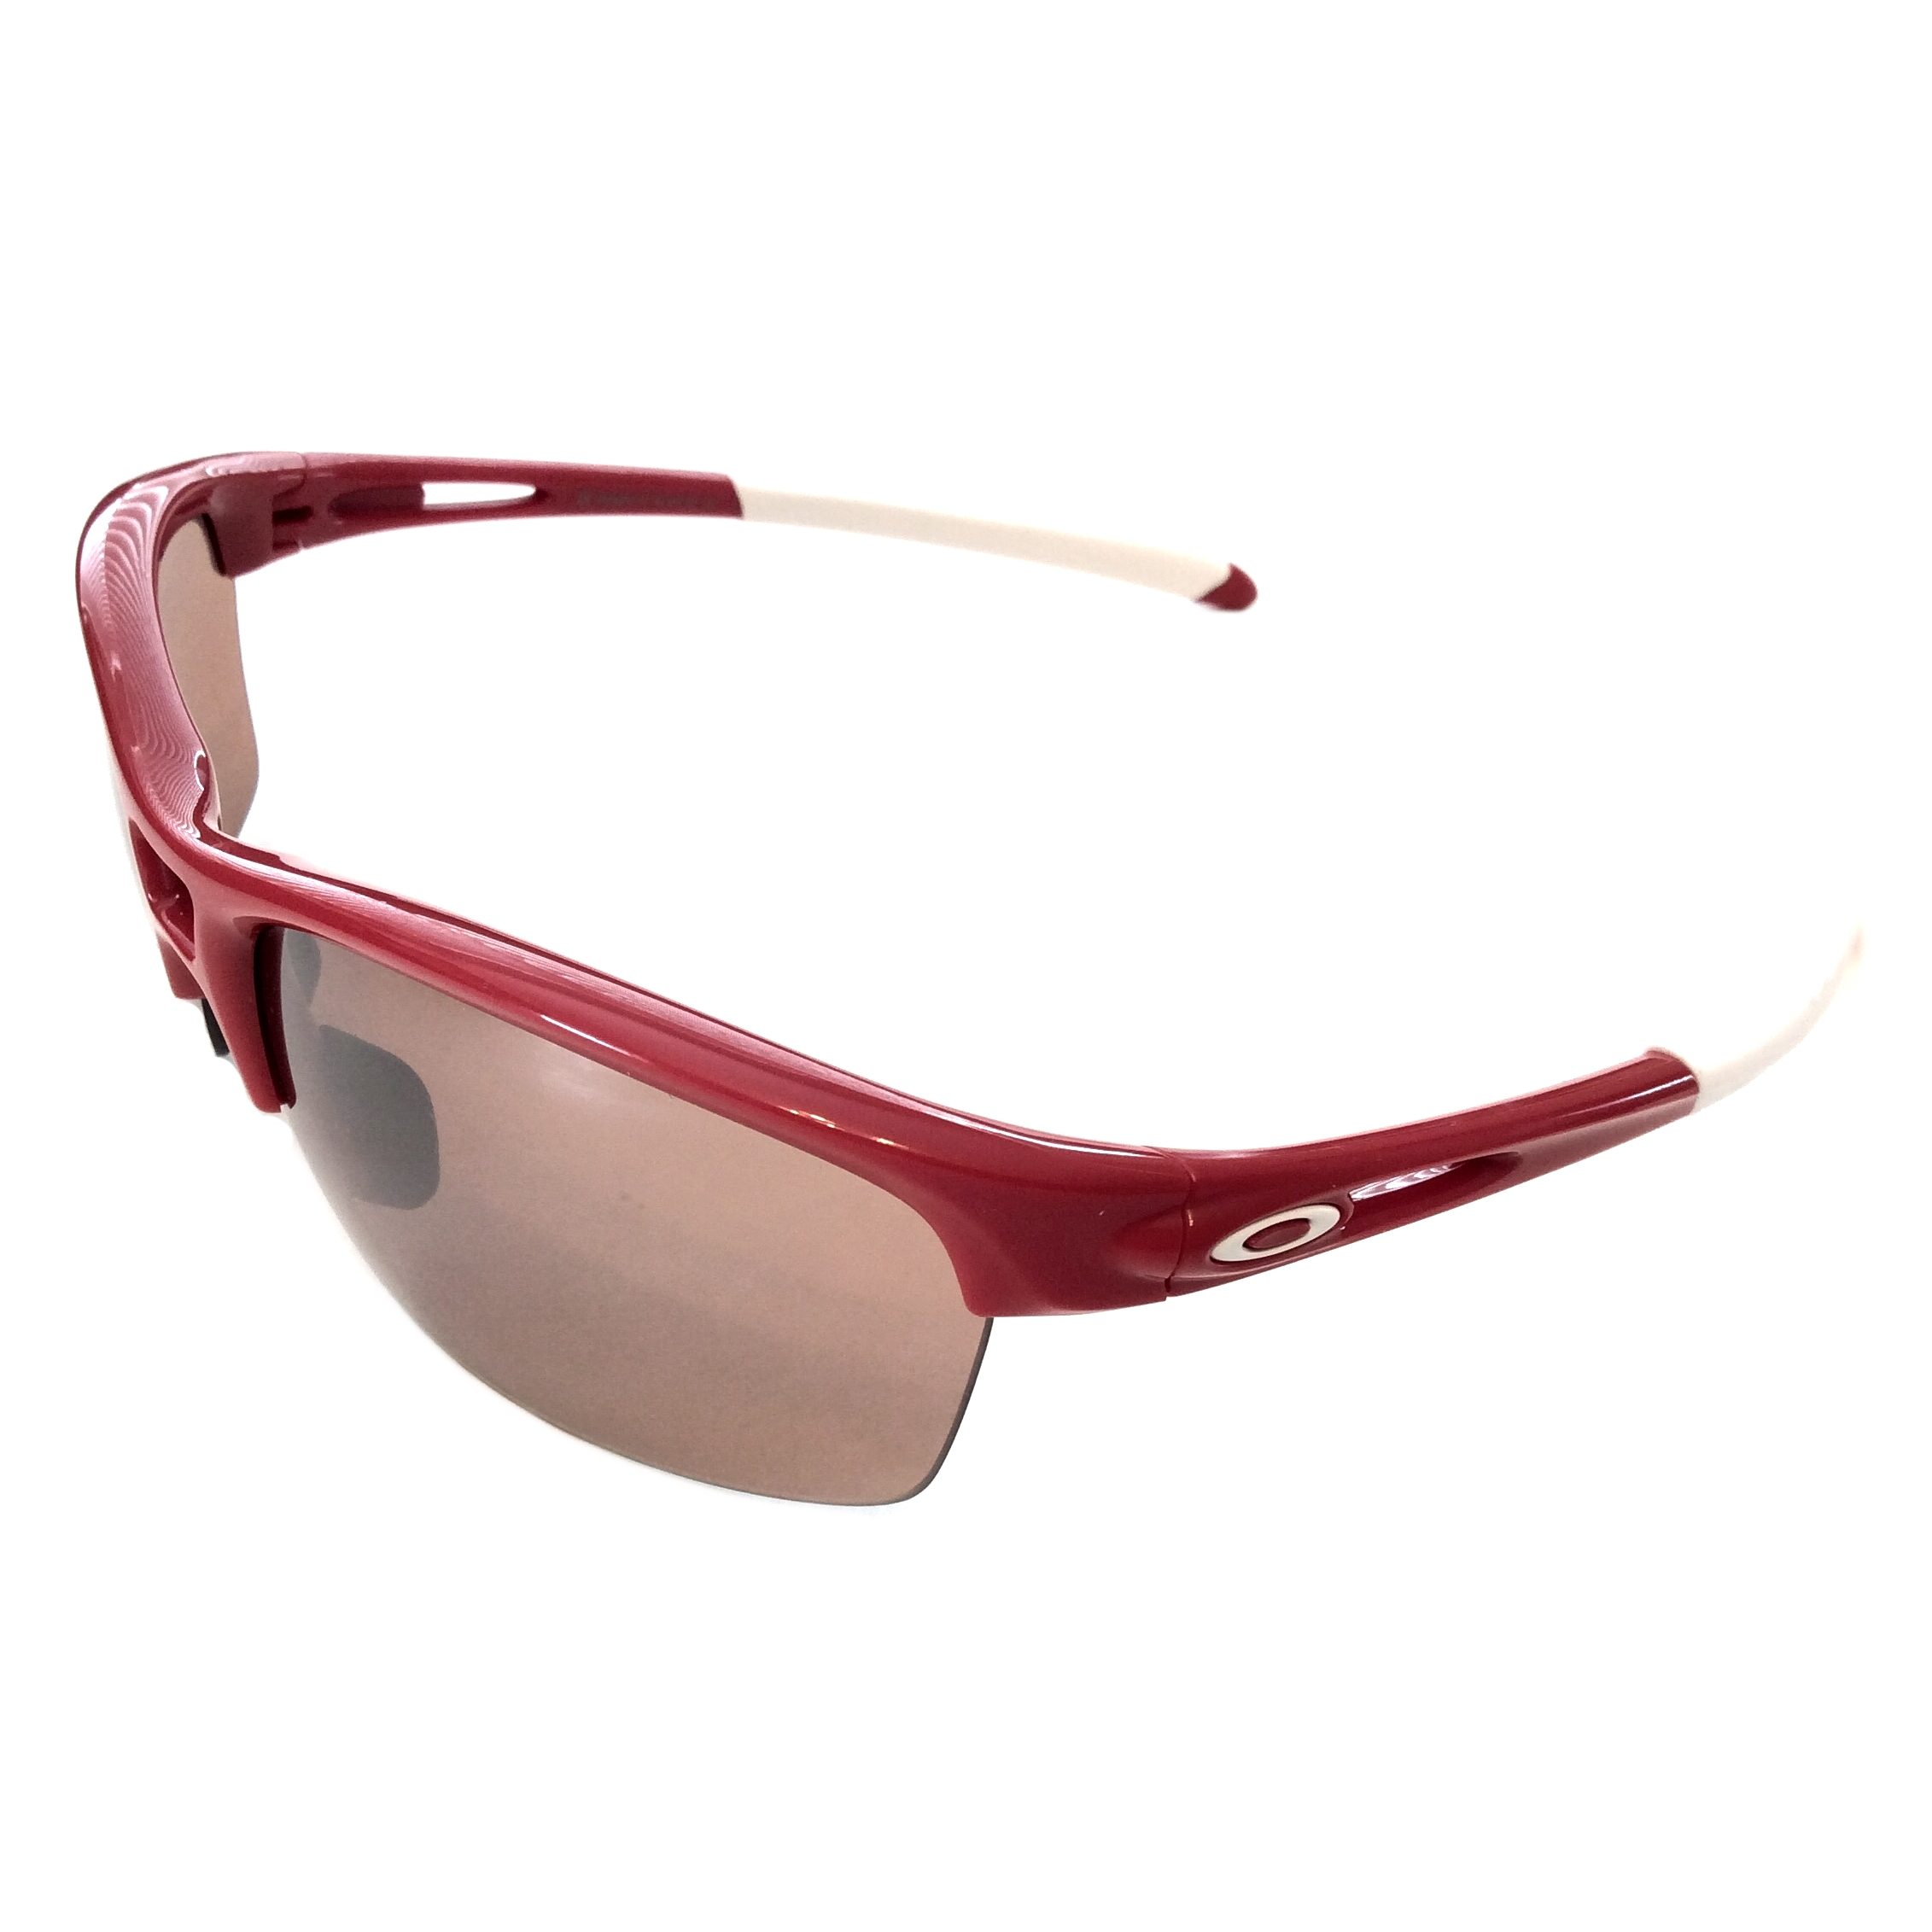 ae180e07289 Oakley Oo Red Iridium Polarized Lens Review « Heritage Malta